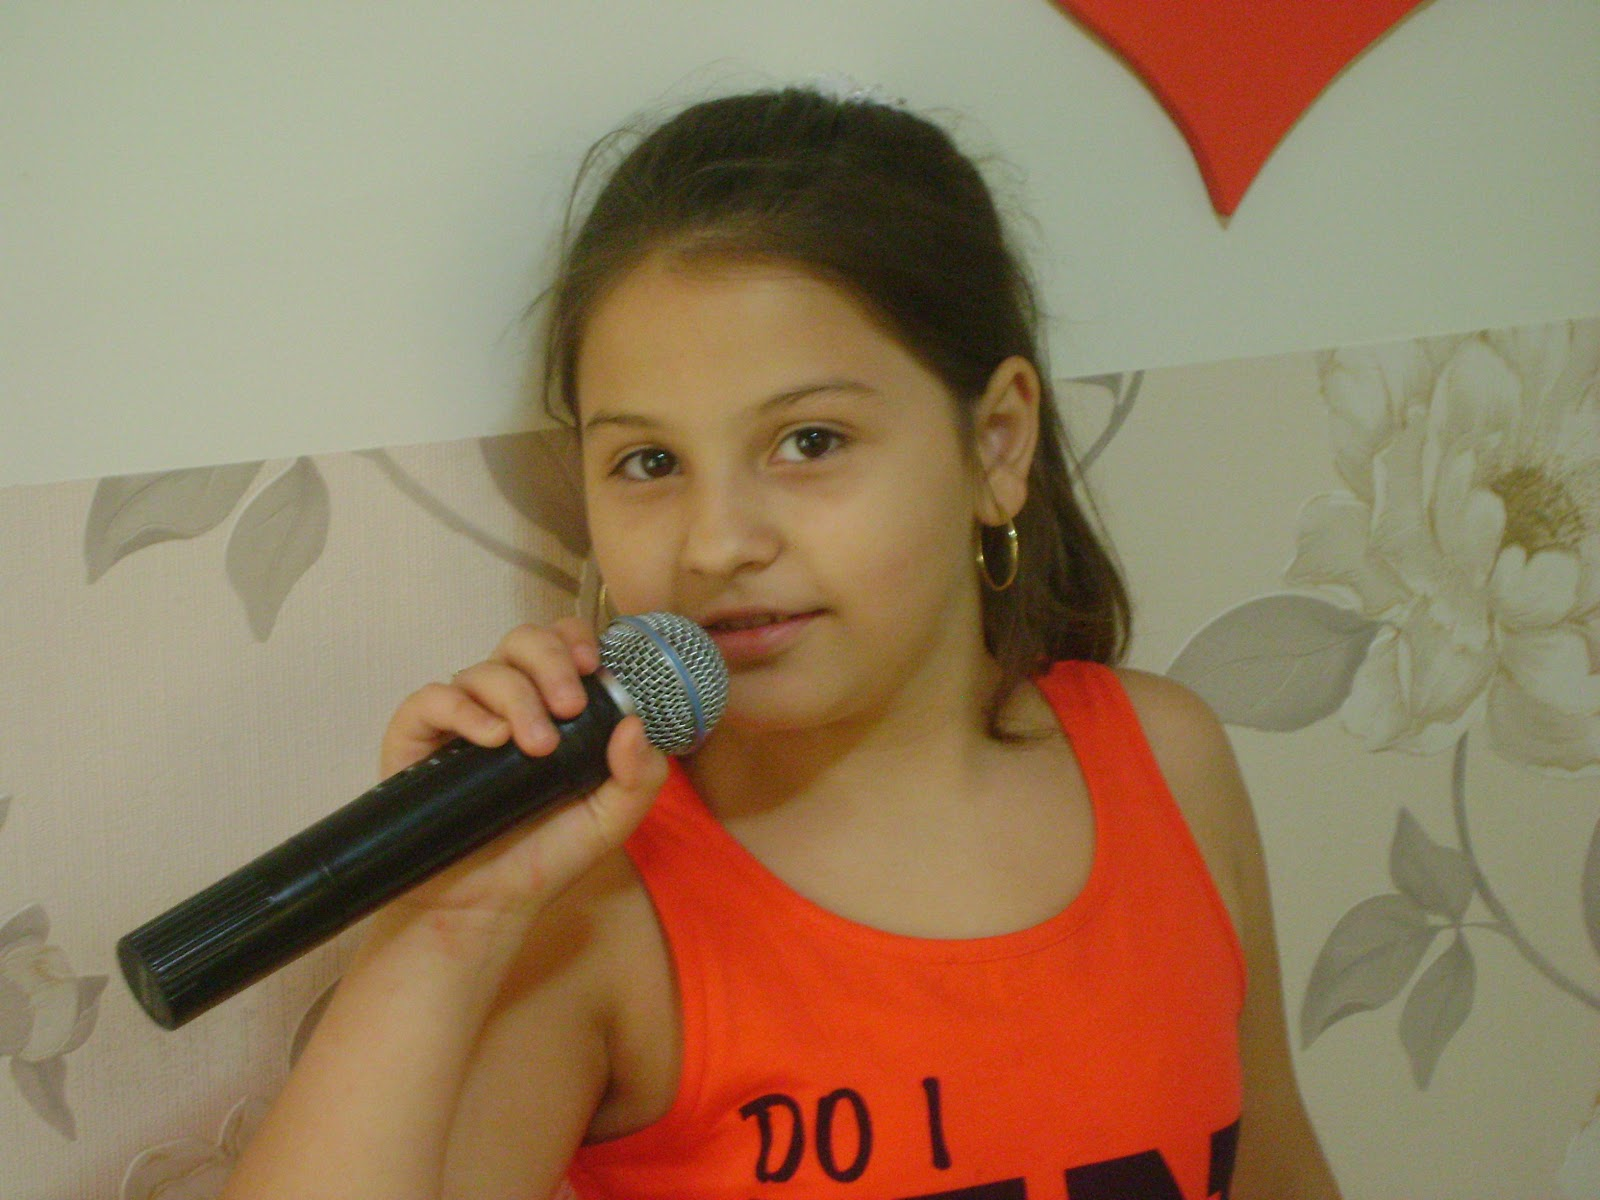 Alina radu from bucharest - 5 5